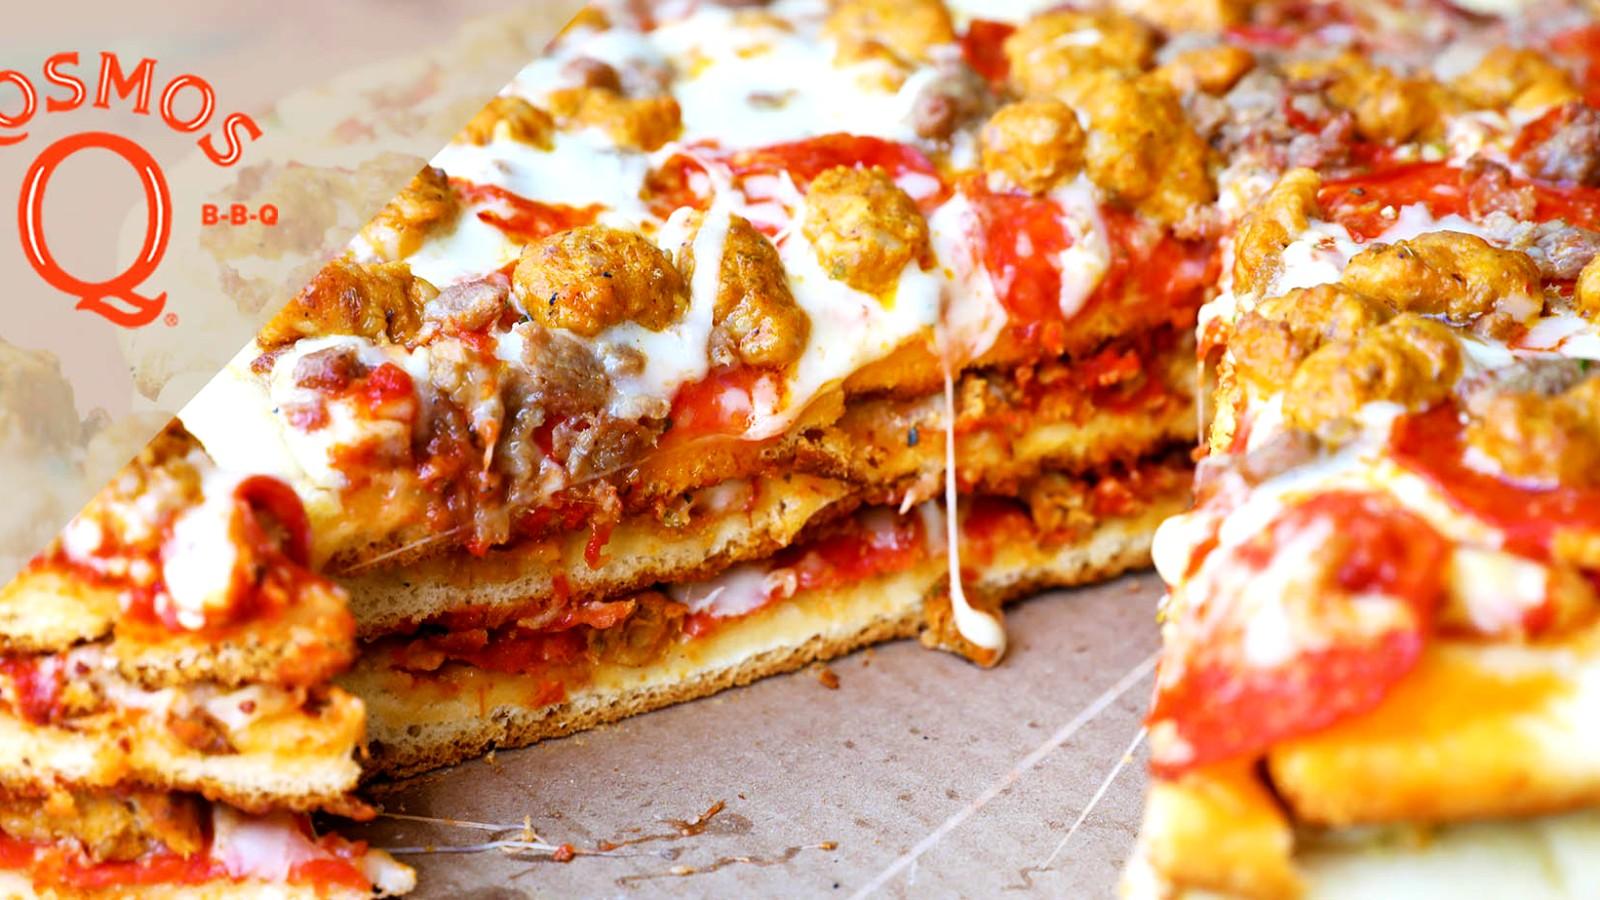 Image of Quick Redneck-Style Smoked Pizza